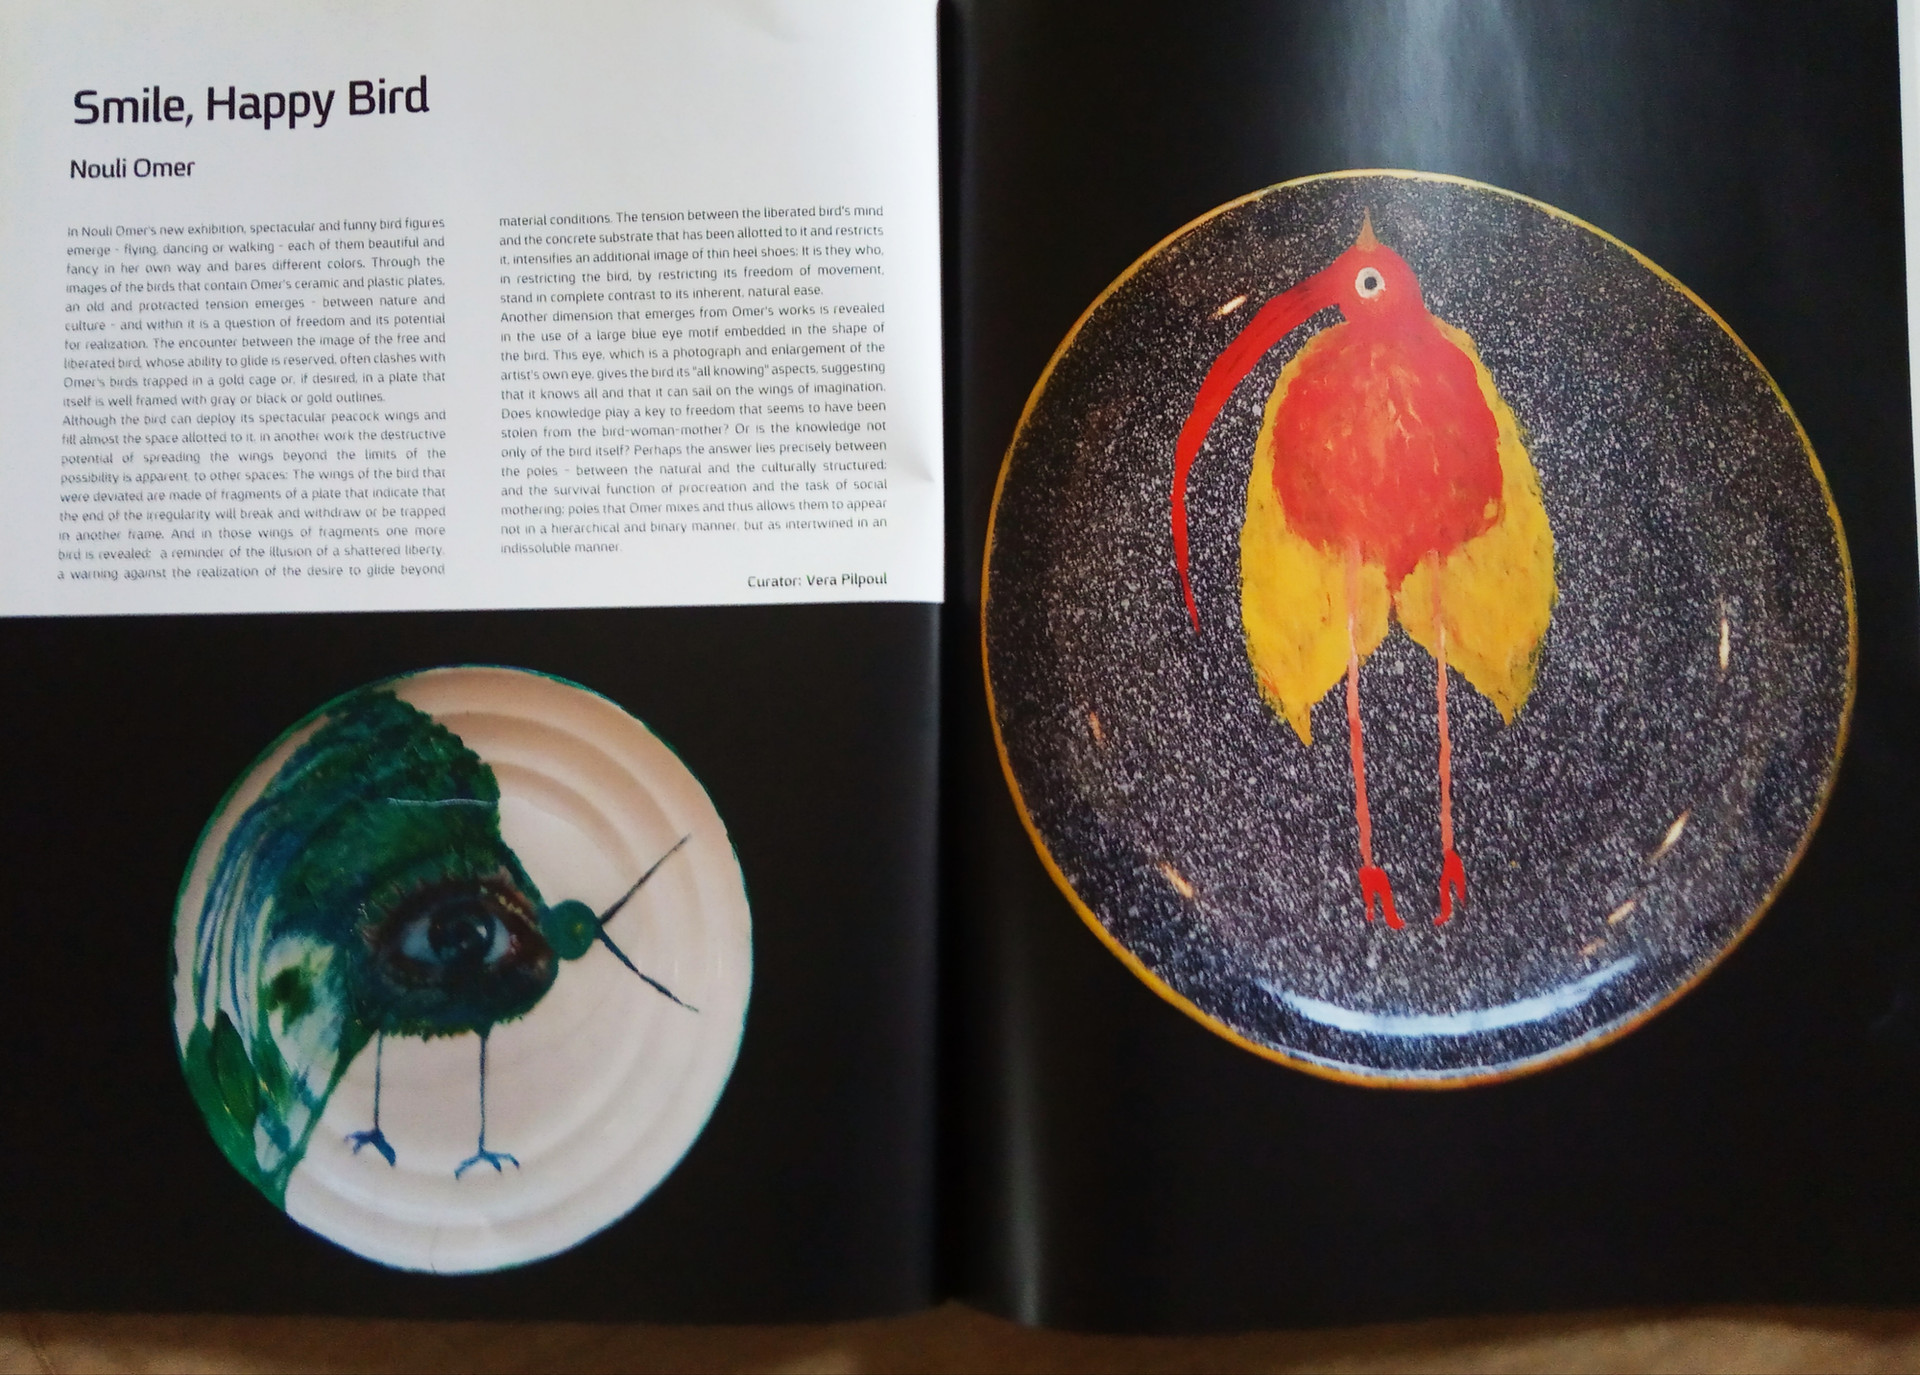 Smile happy bird, solo exhibition, artist talk  2017, artists house, tel aviv, kan magazine 2017